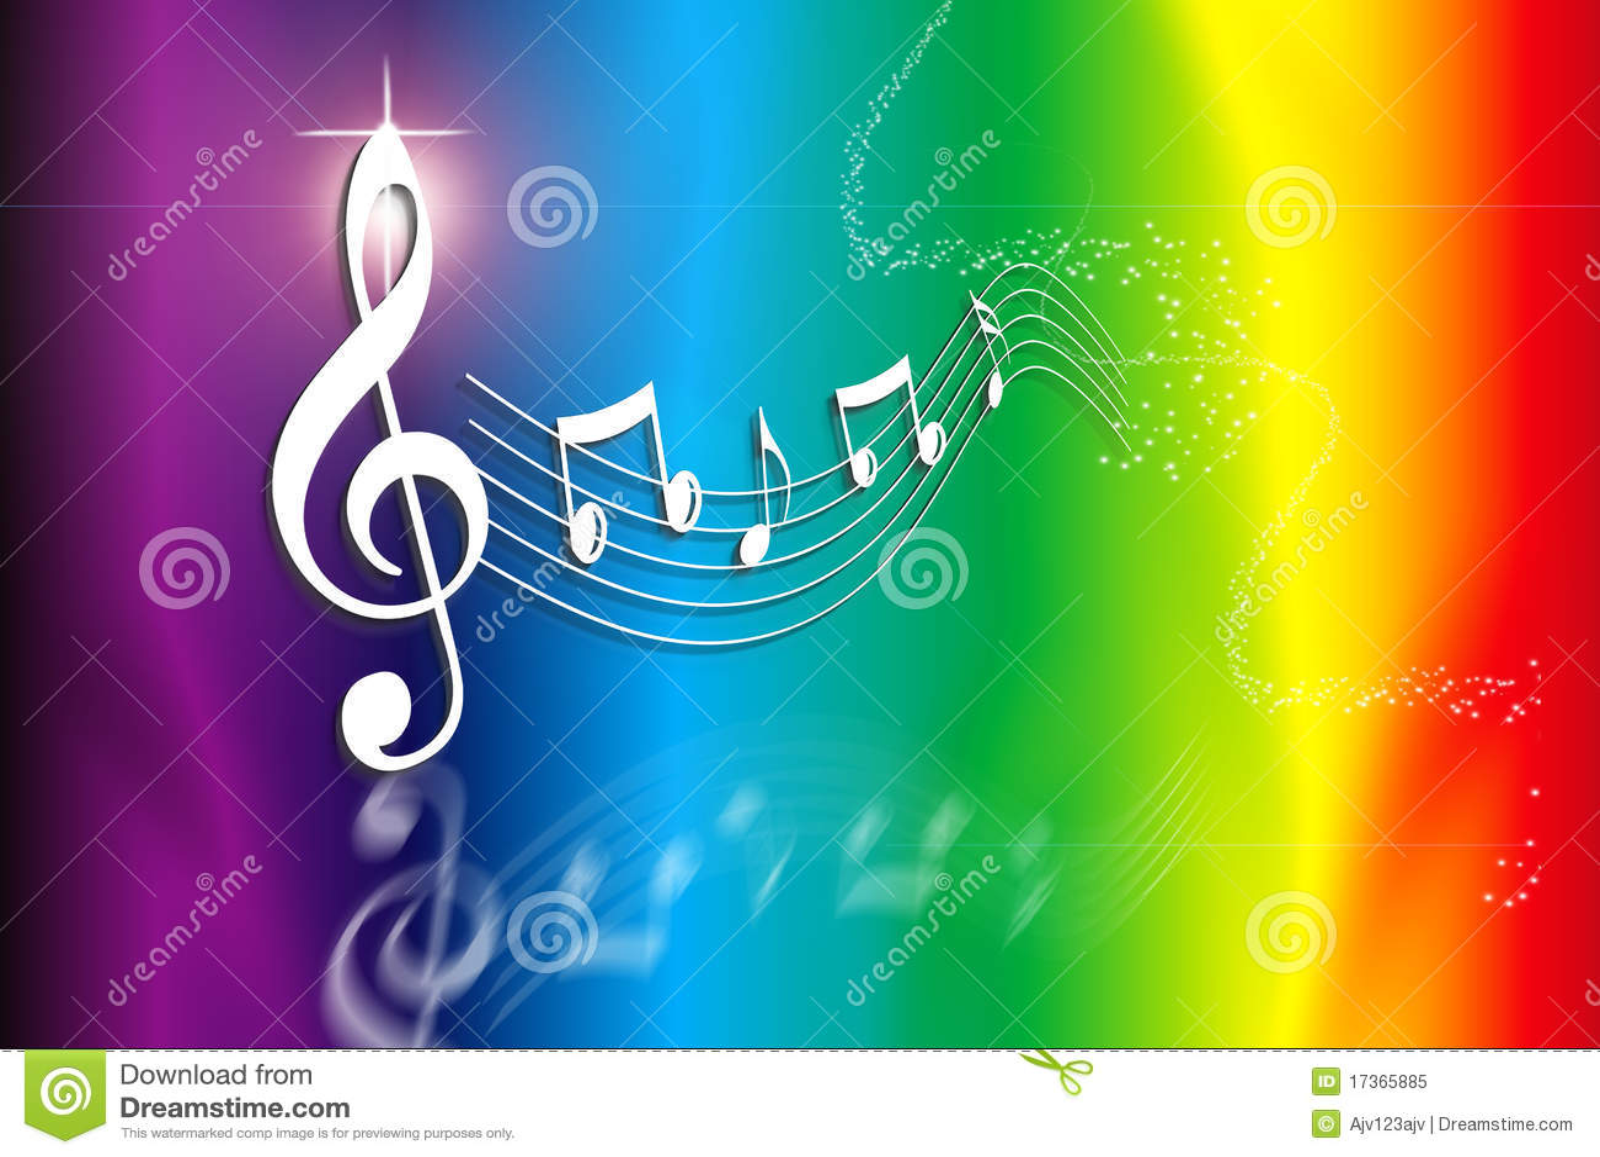 Rainbow Music Royalty Free Stock Photo